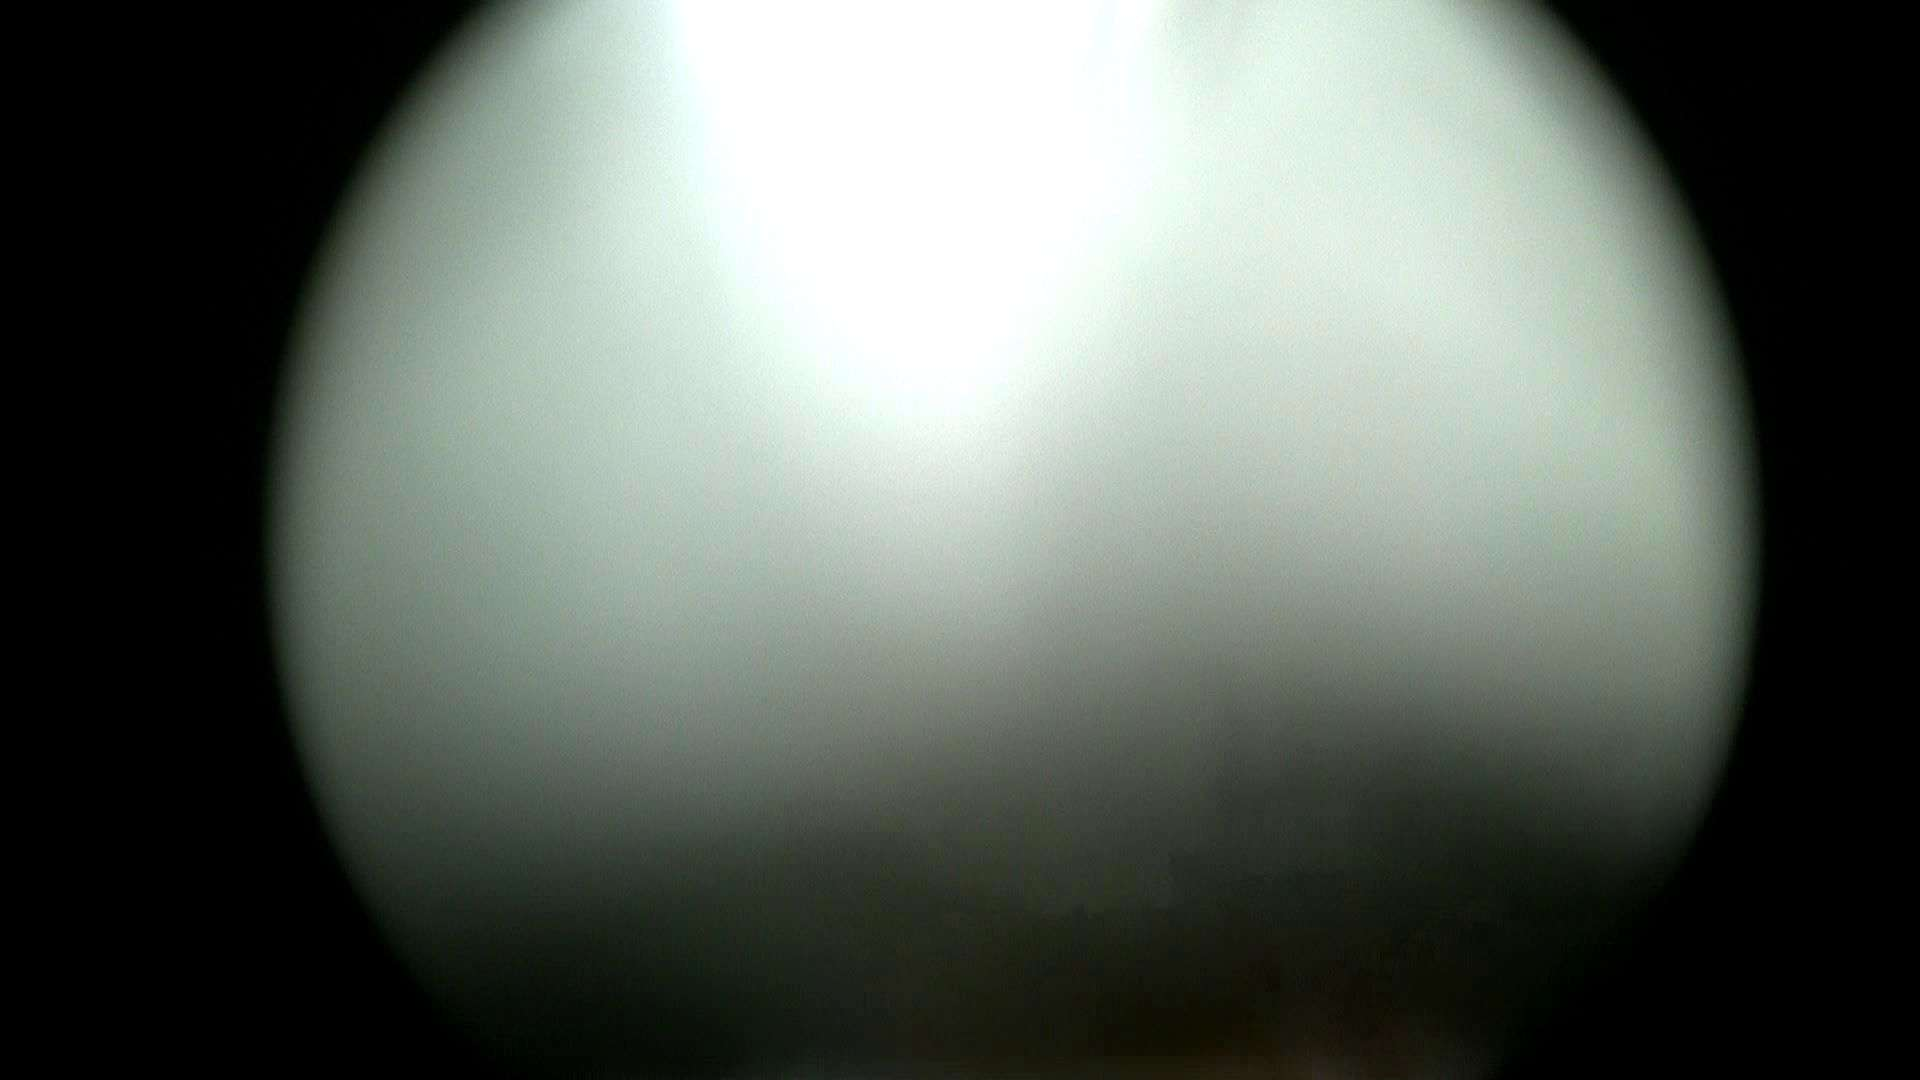 NO.38 いわゆる○女太り シャワー室 エロ画像 61画像 60